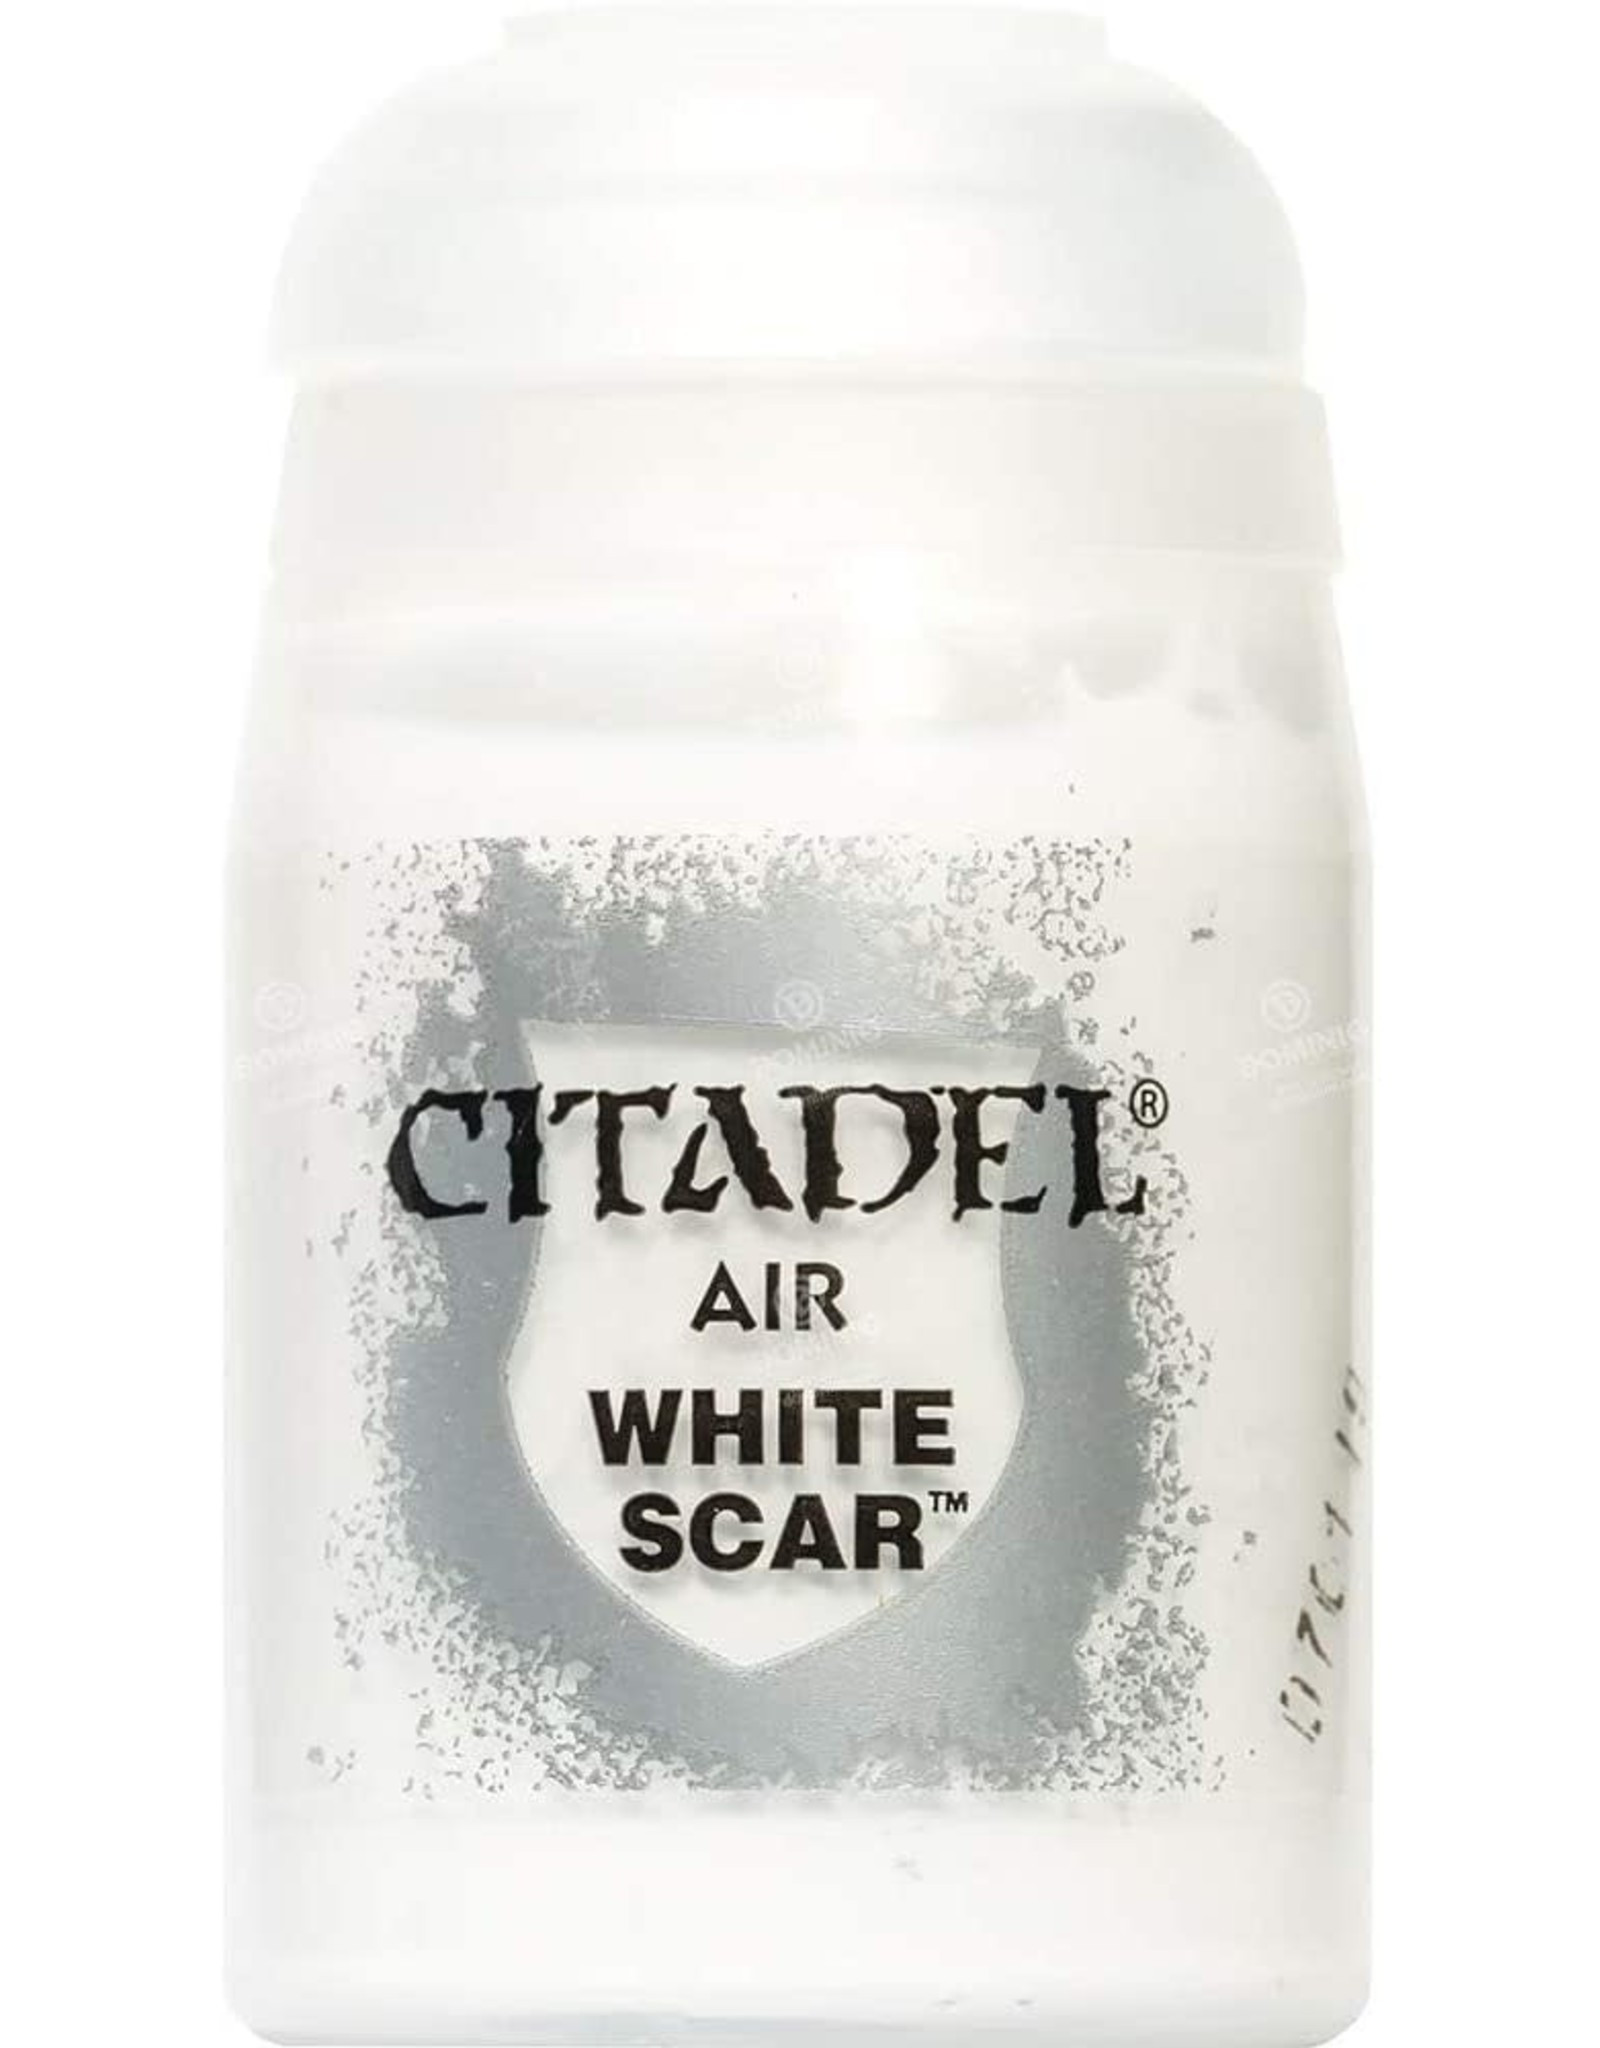 Games Workshop Citadel Paint: White Scar Air (24 ml)